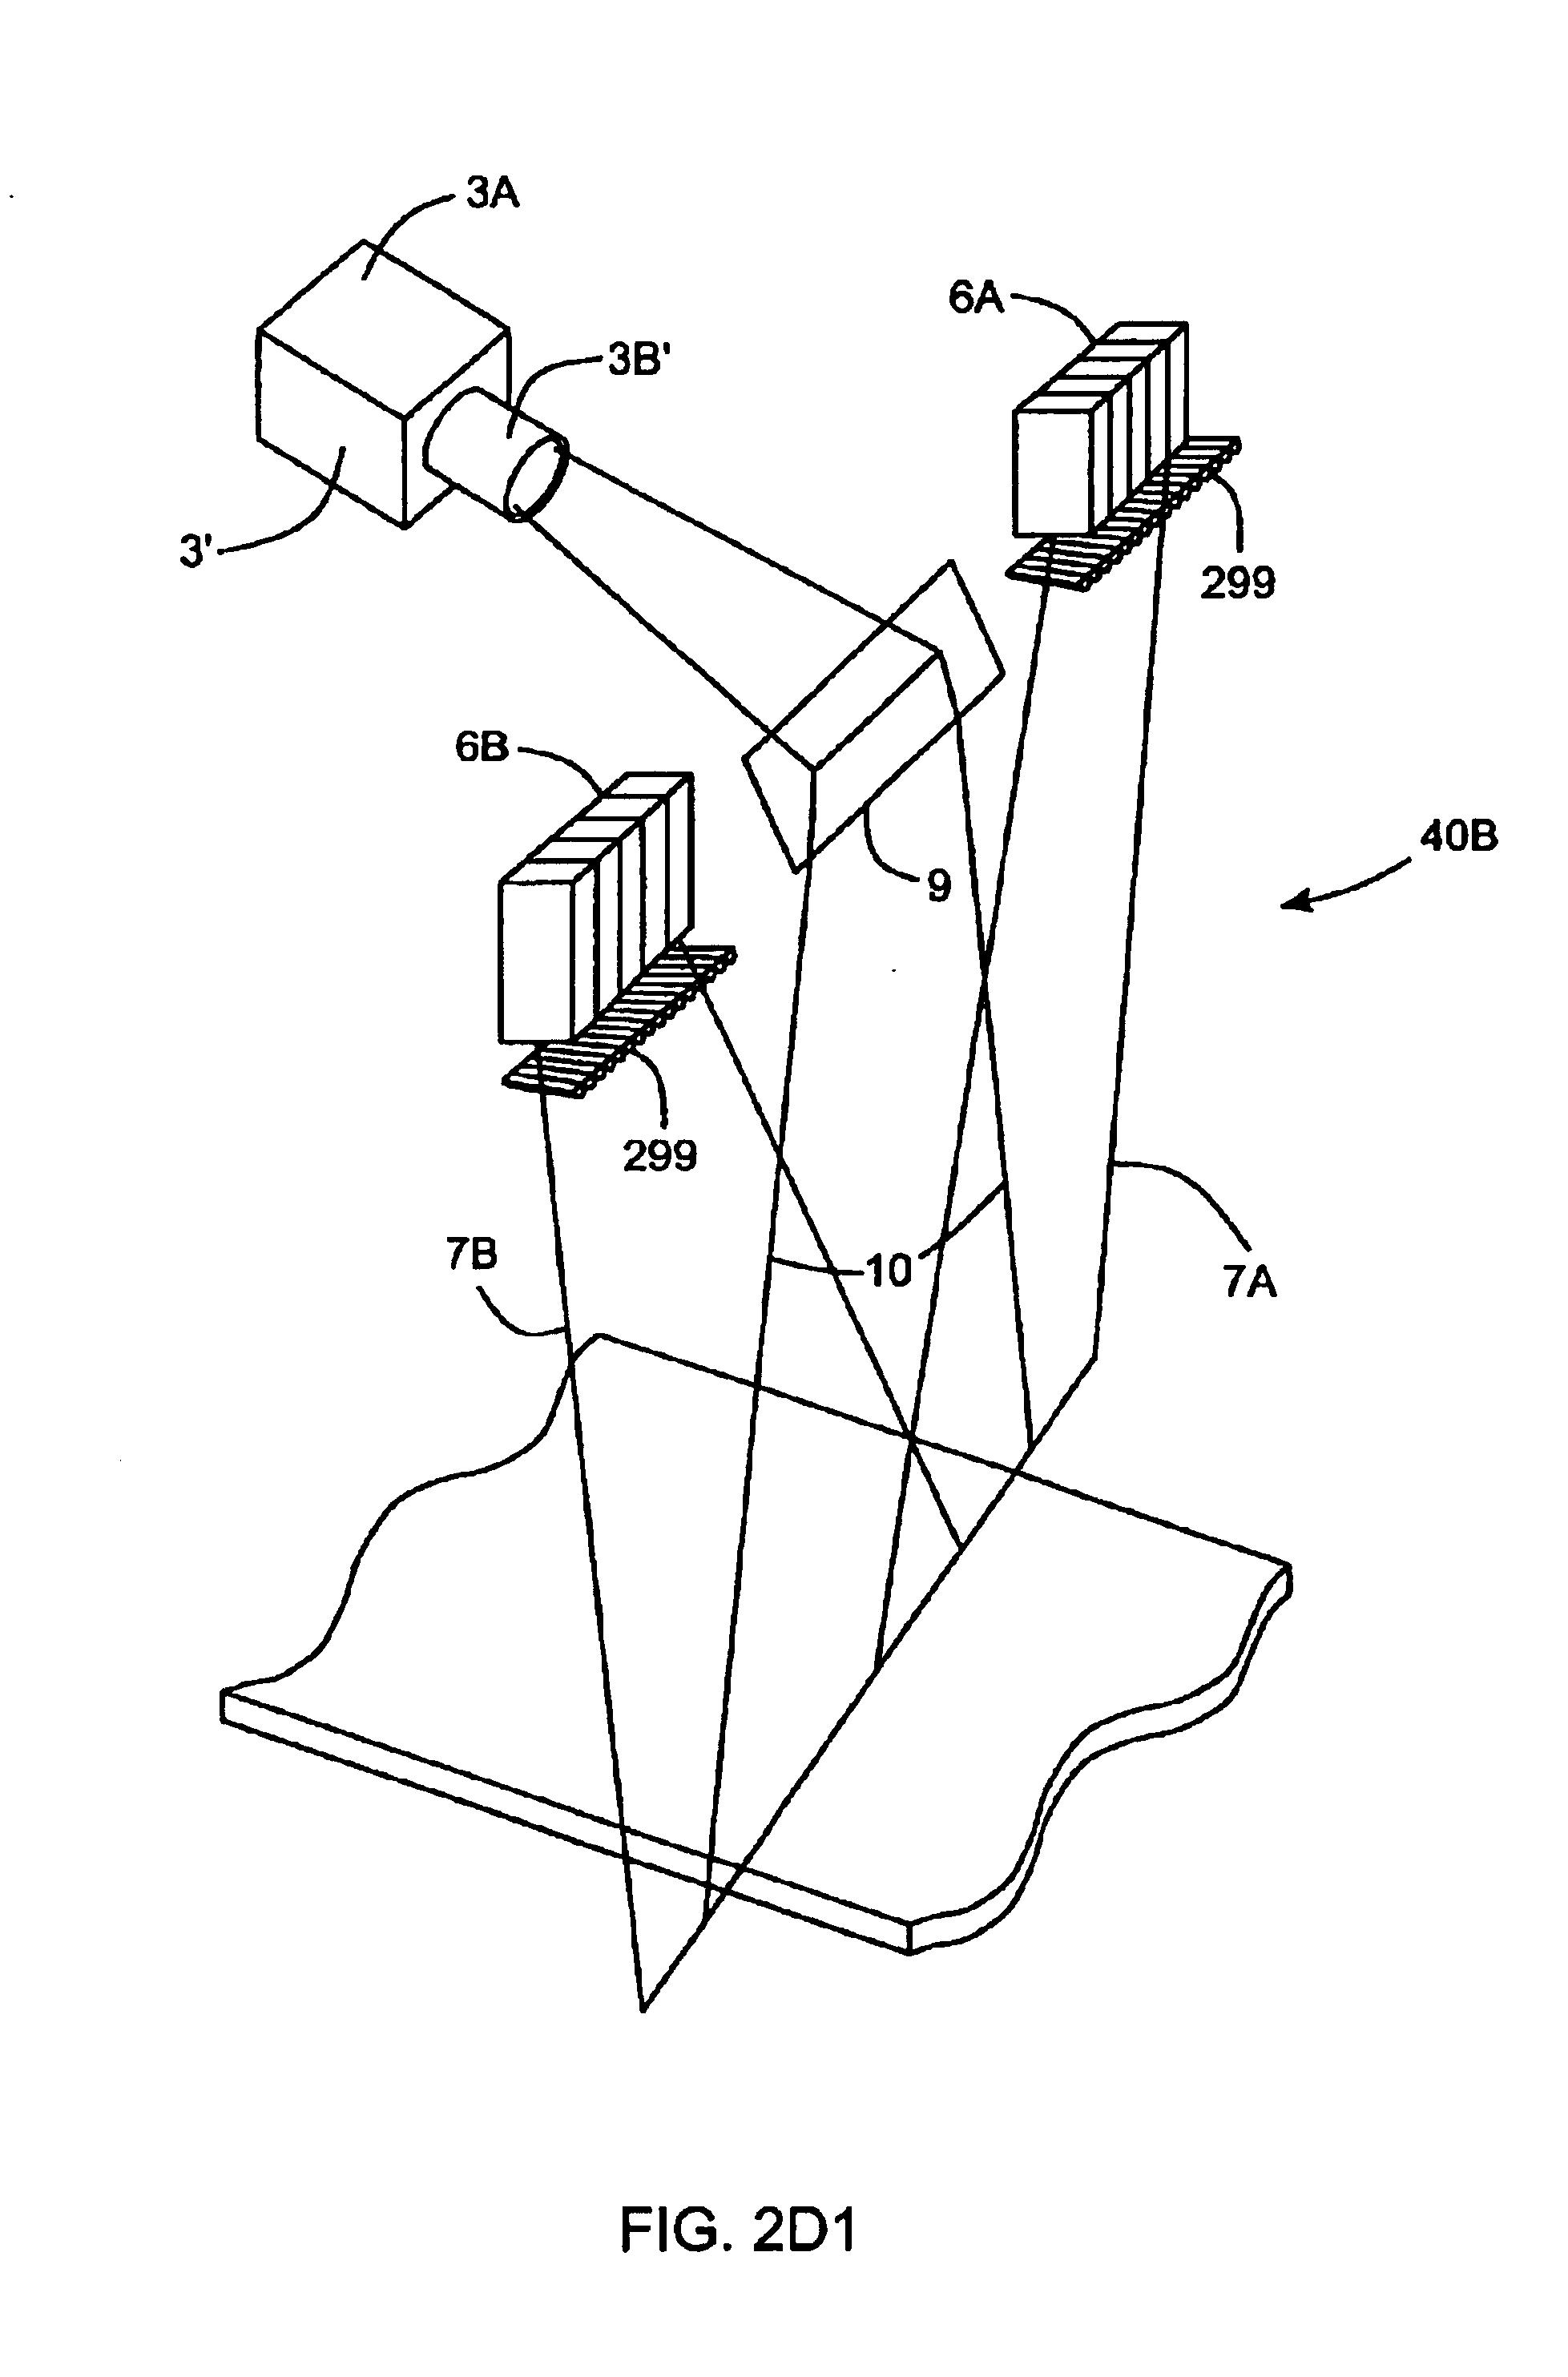 Patent US 7,086,594 B2